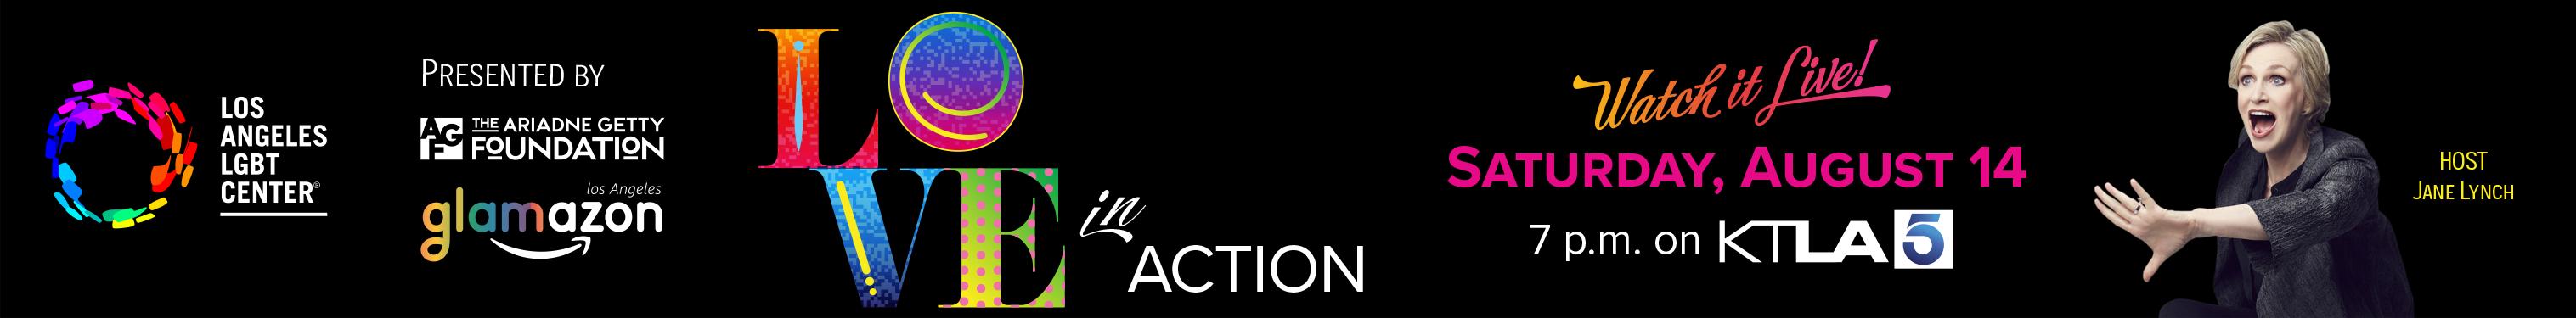 Love in Action August 14 on KTLA